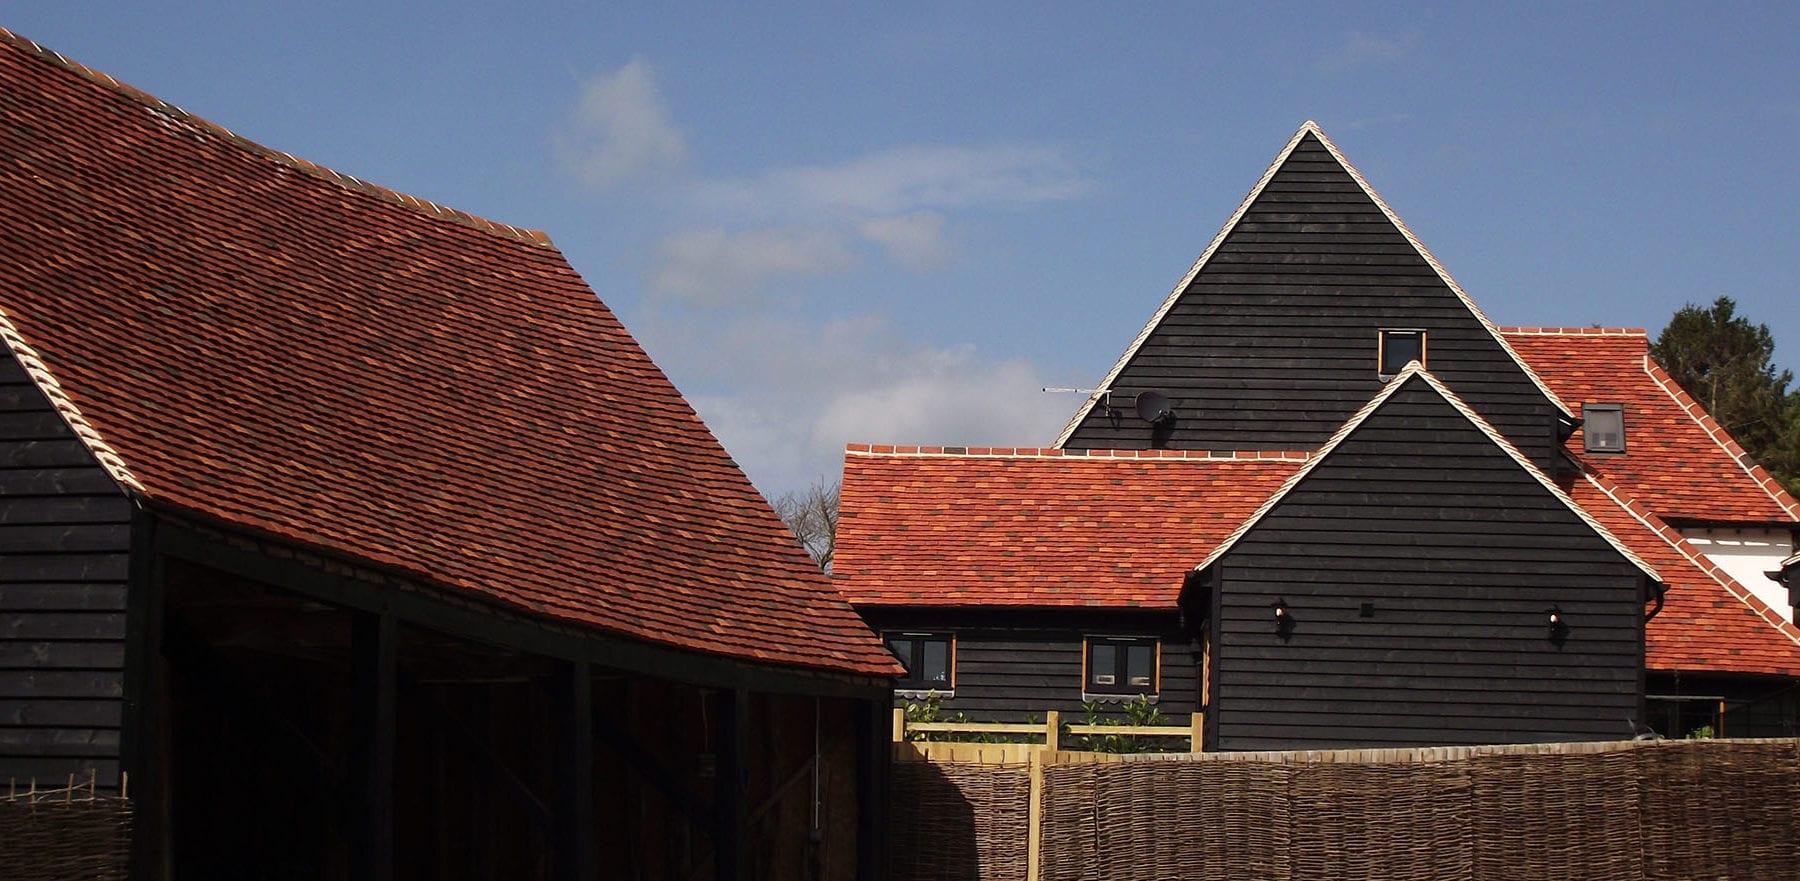 Lifestiles - Handmade Multi Clay Roof Tiles - De Vere, England 4